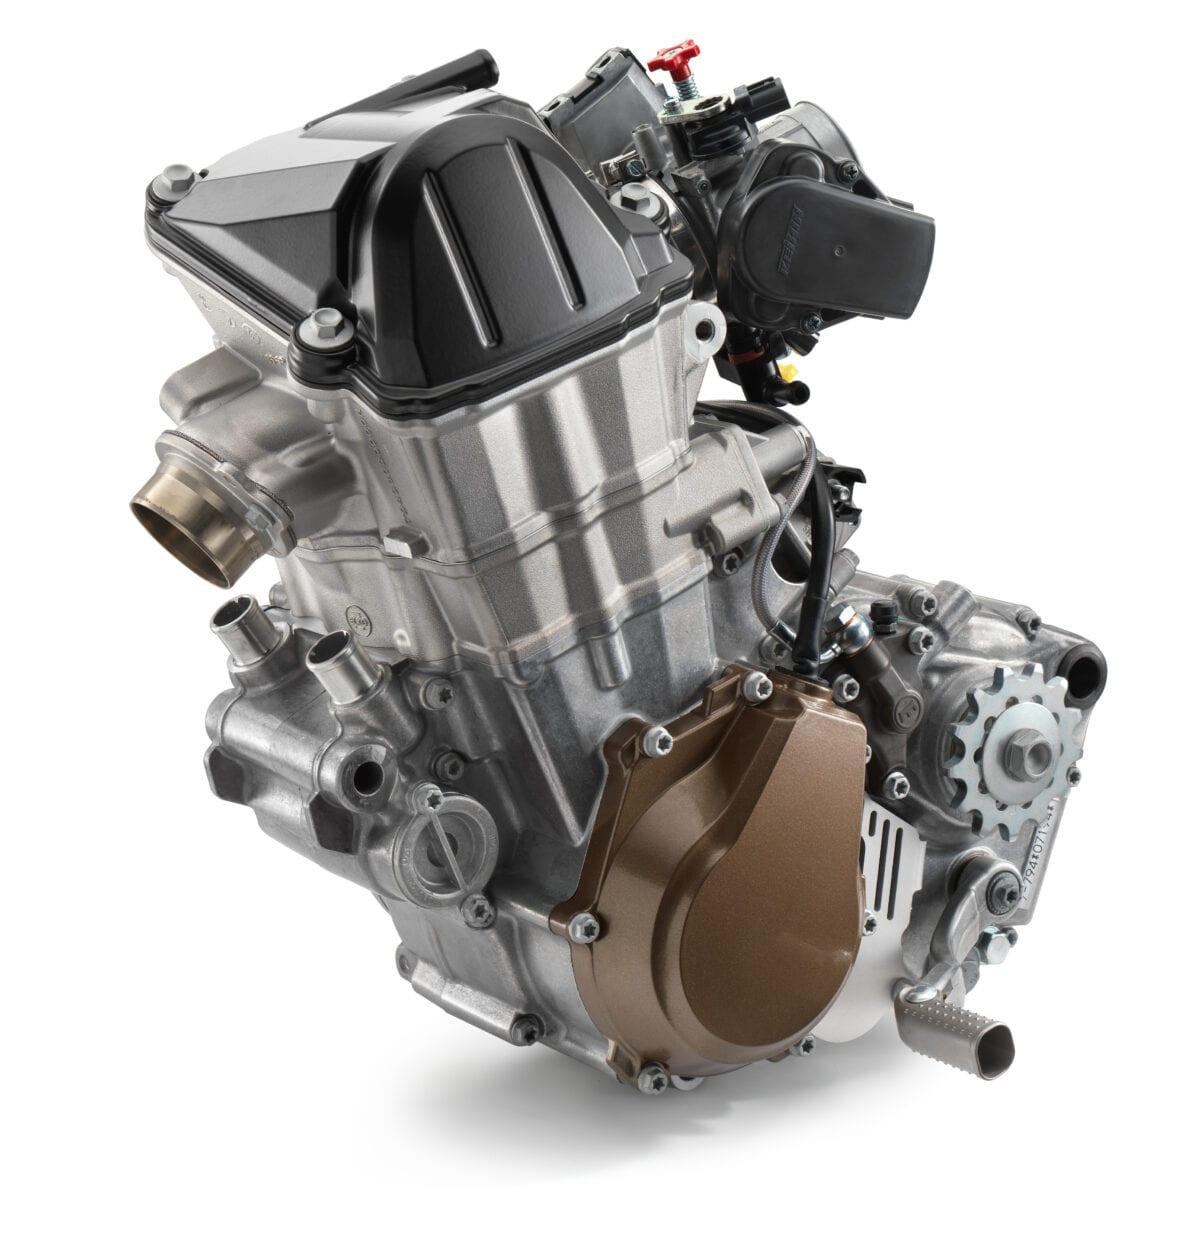 21976_FC-450-2017-engine